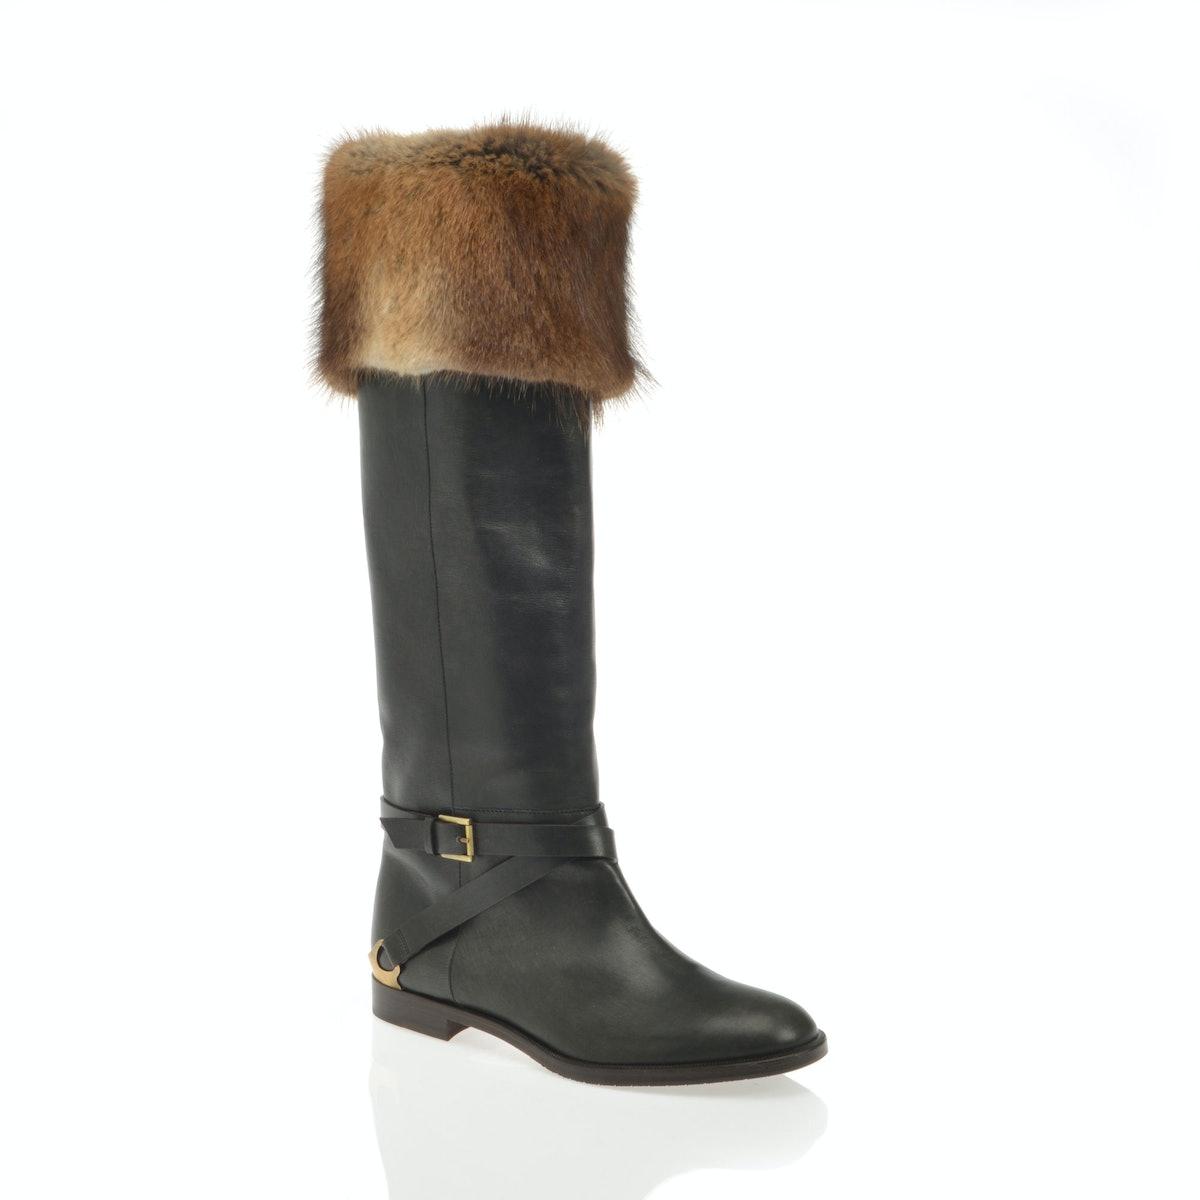 Fratelli Rossetti boots, $1,390, Fratelli Rossetti, New York, 212.888.5107.